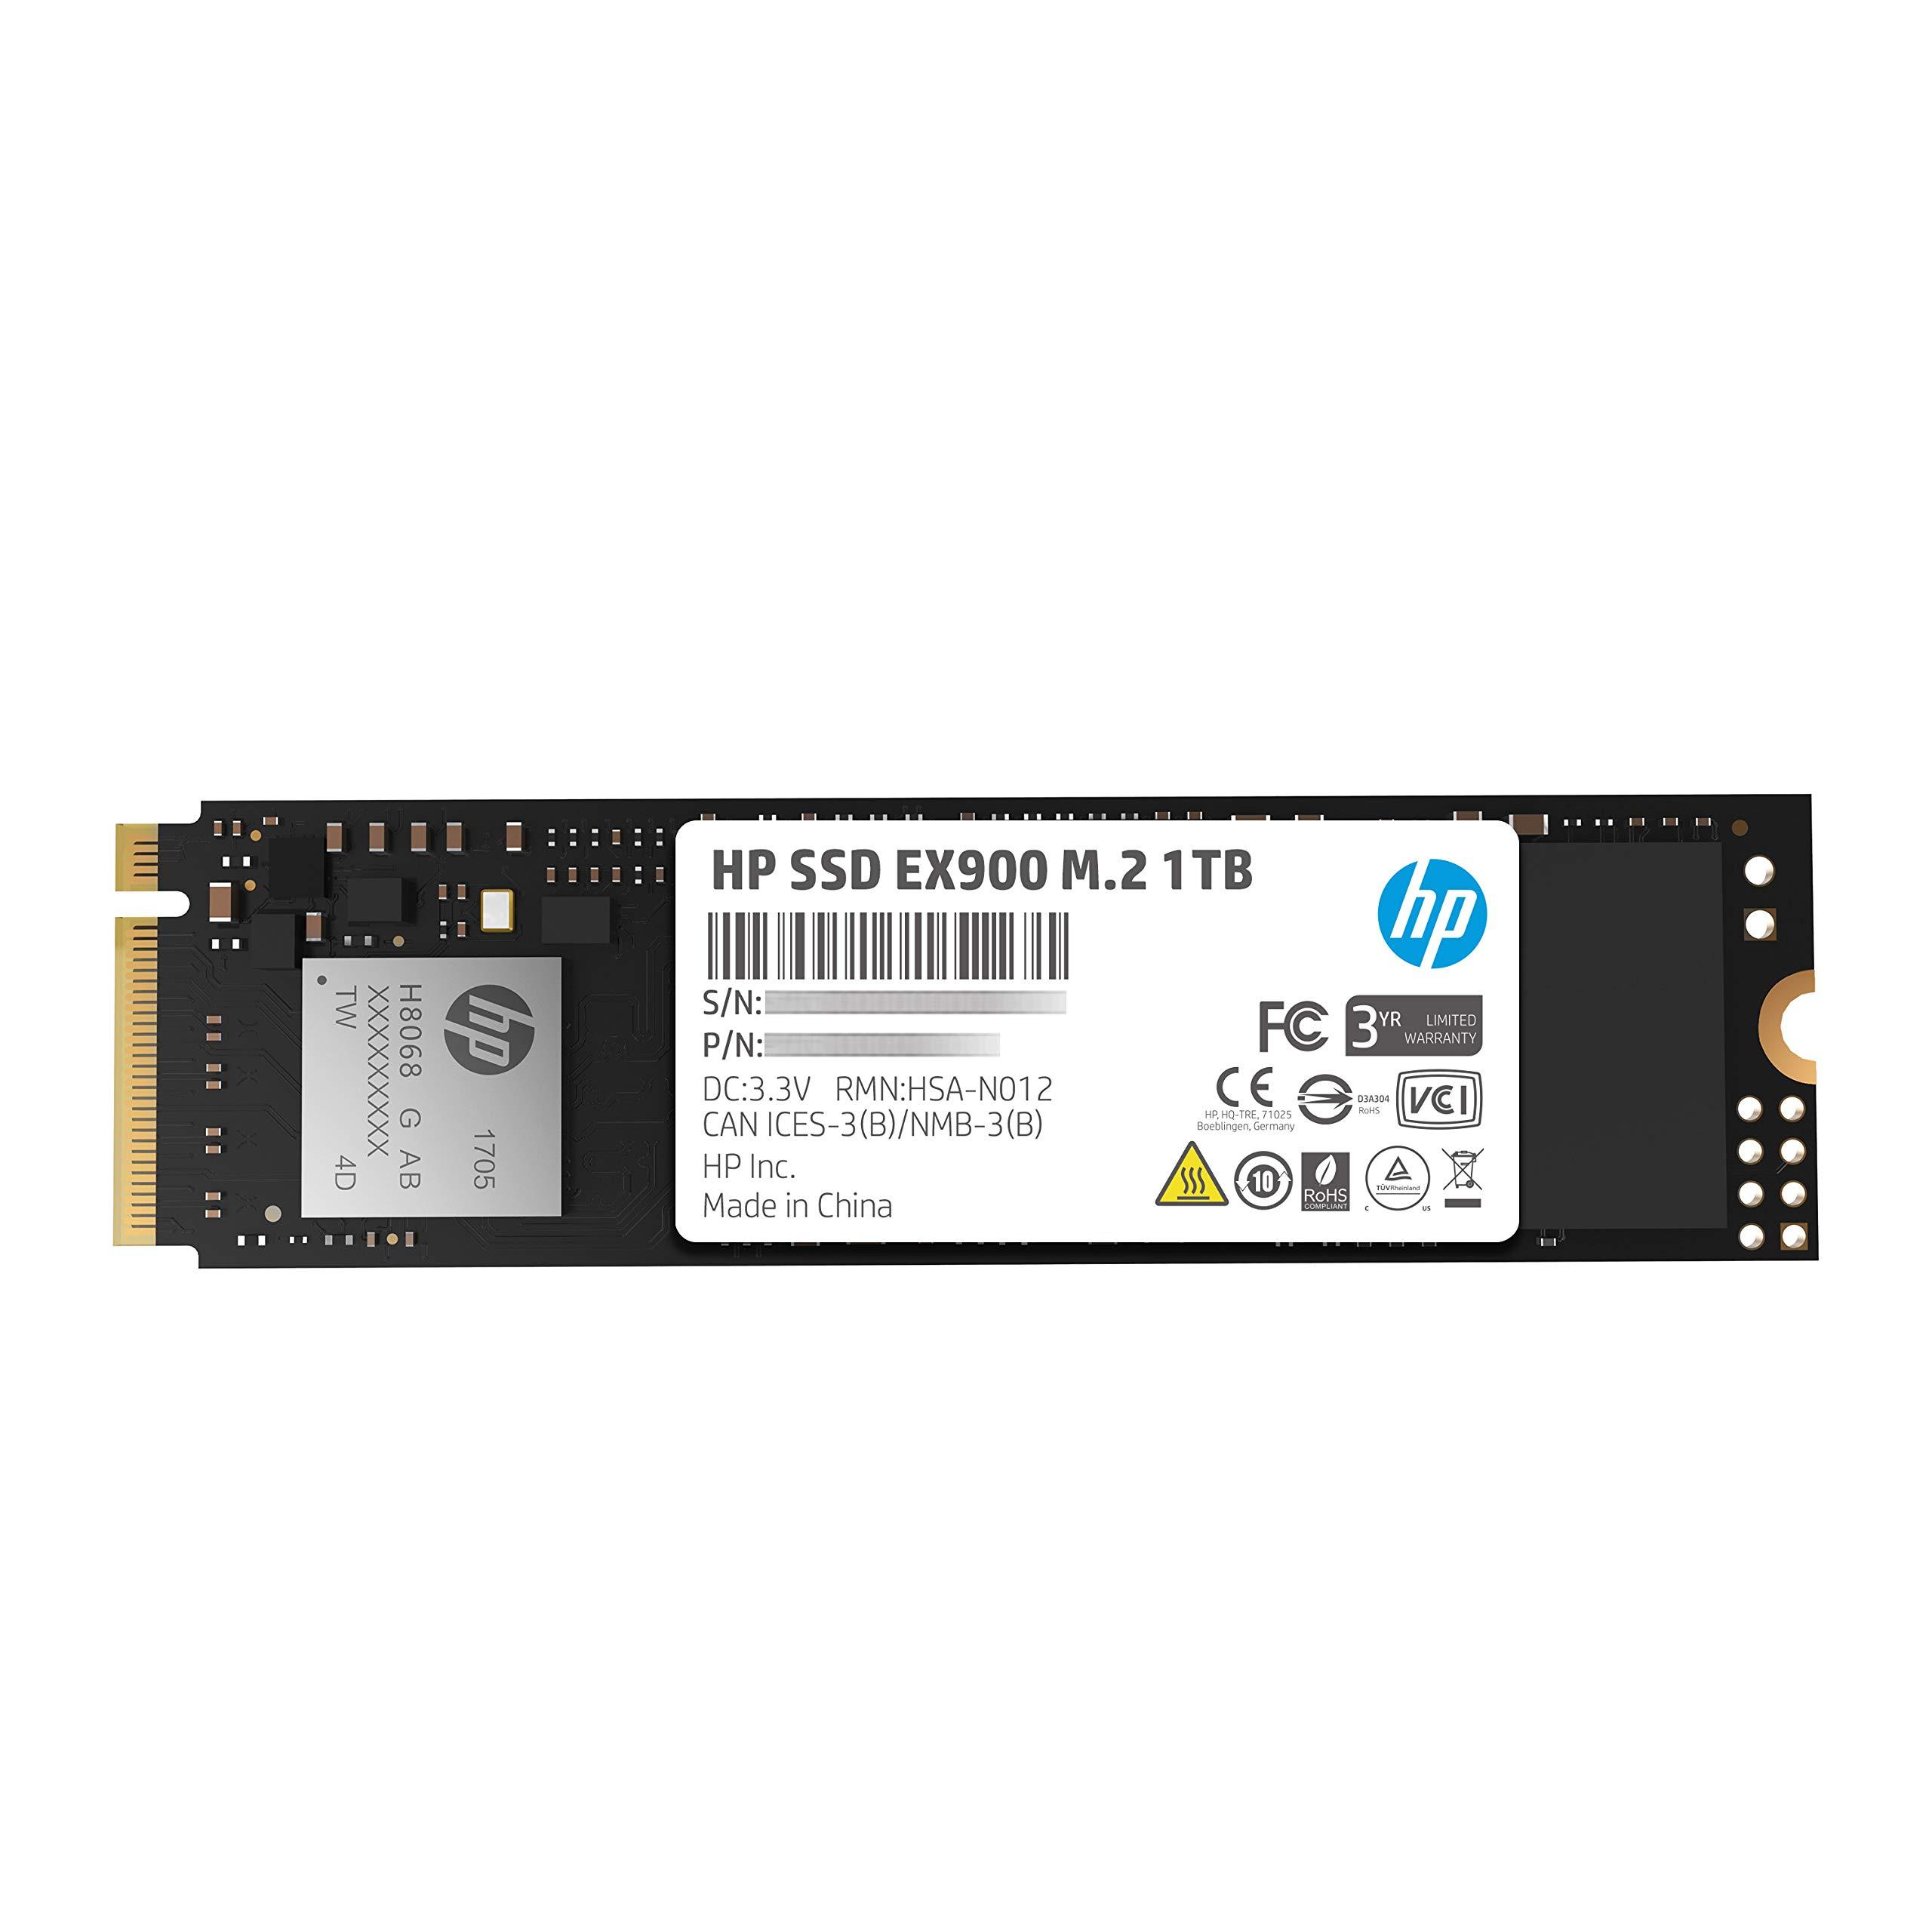 HP EX900 M.2 1TB PCIe 3.1 X4 Nvme 3D TLC NAND Internal Solid State Drive (SSD) Max 2100 Mbps 5Xm46Aa#ABC